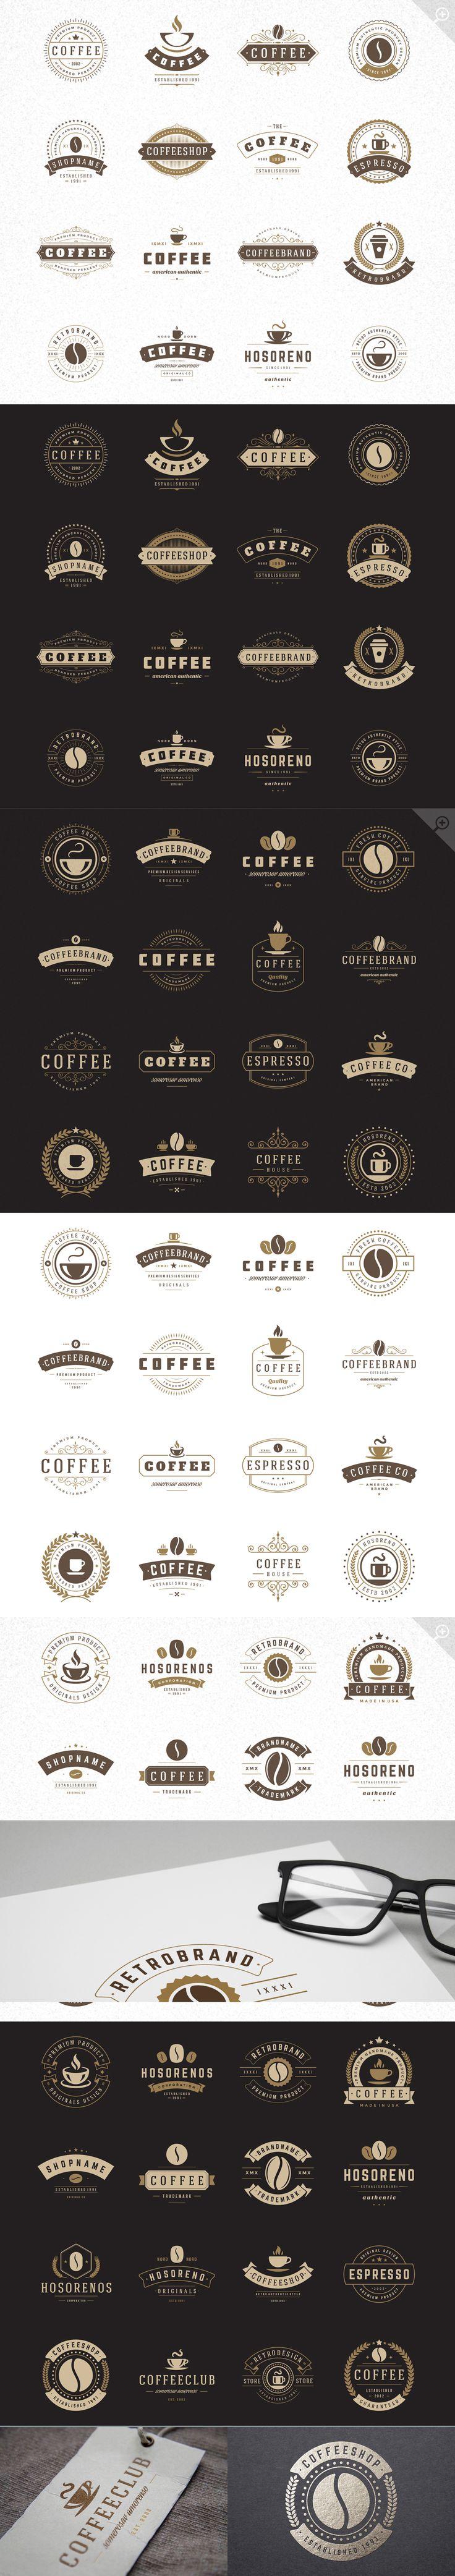 48 Coffee Logotypes and Badges #design Download: https://creativemarket.com/VasyaKo/382432-48-Coffee-Logotypes-and-Badges?u=ksioks